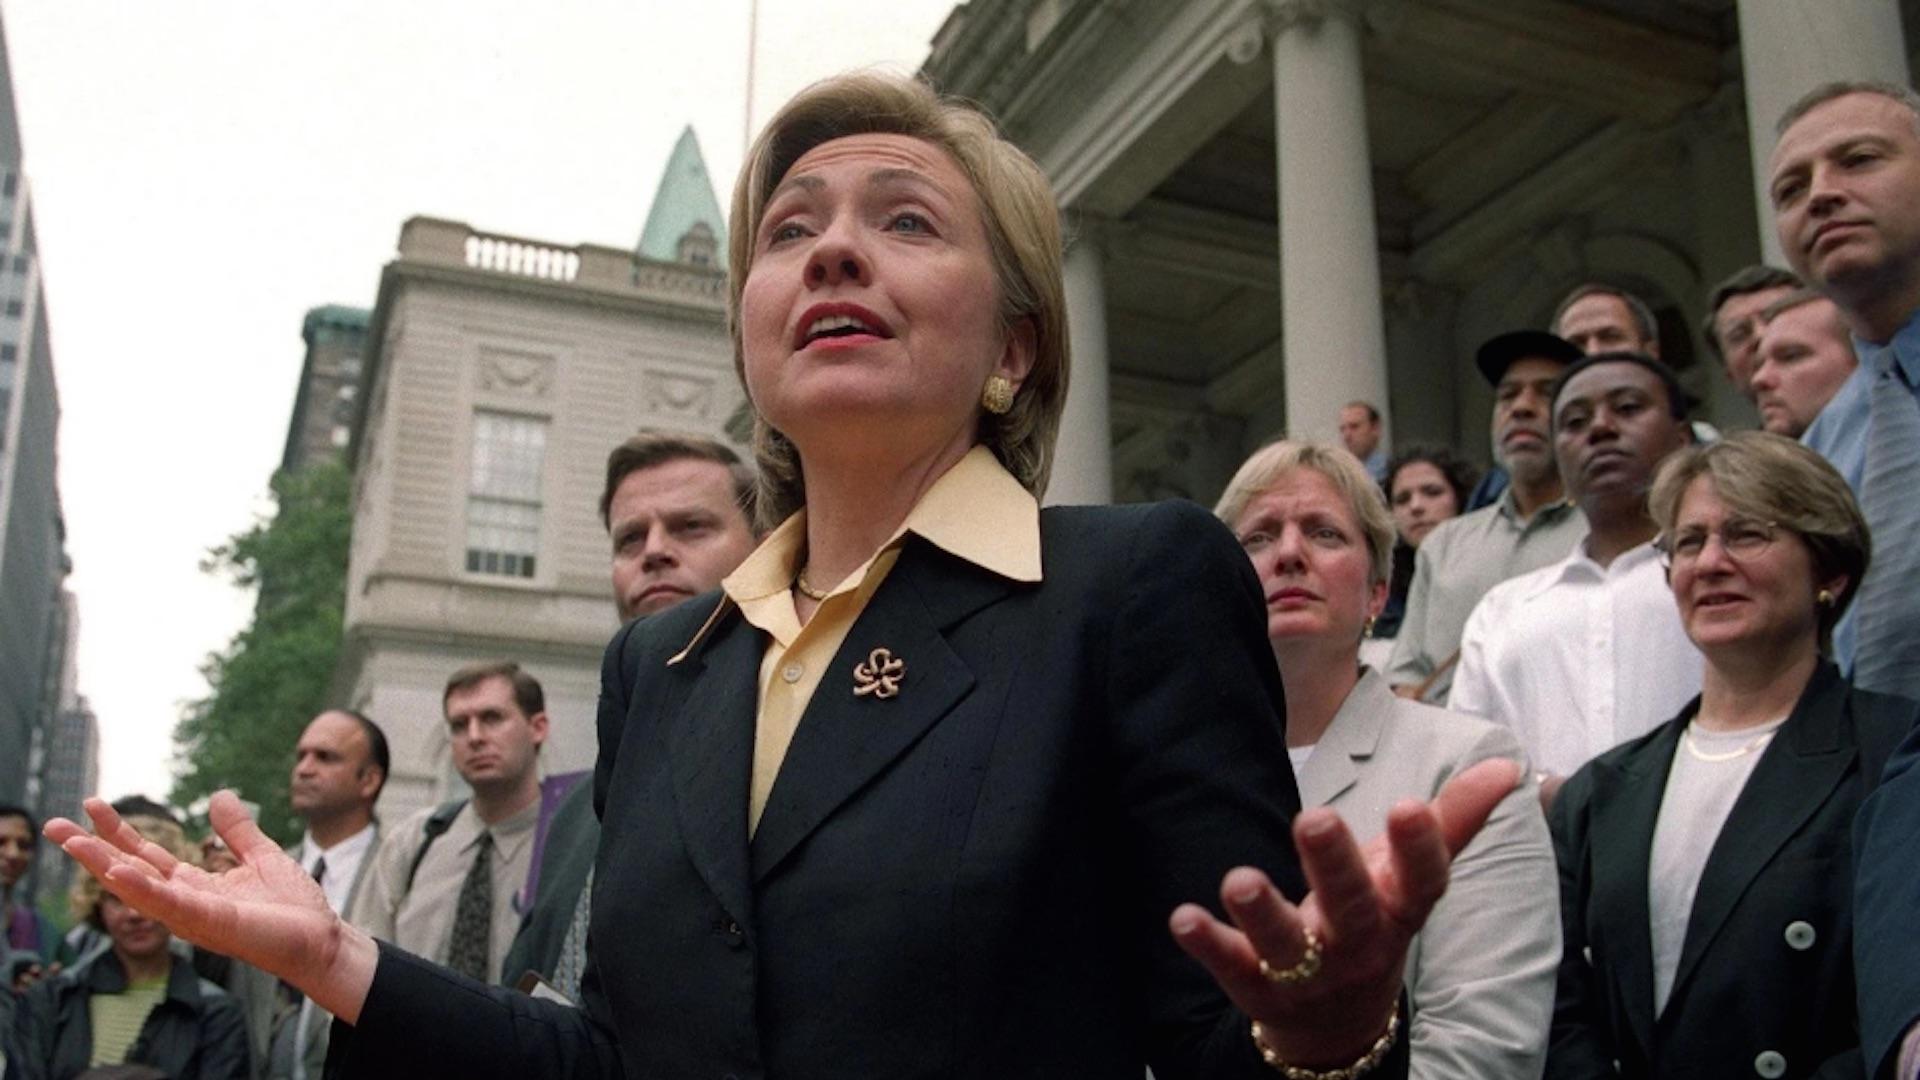 As senator, Clinton promised 200,000 jobs in Upstate New York. Her efforts fell flat.